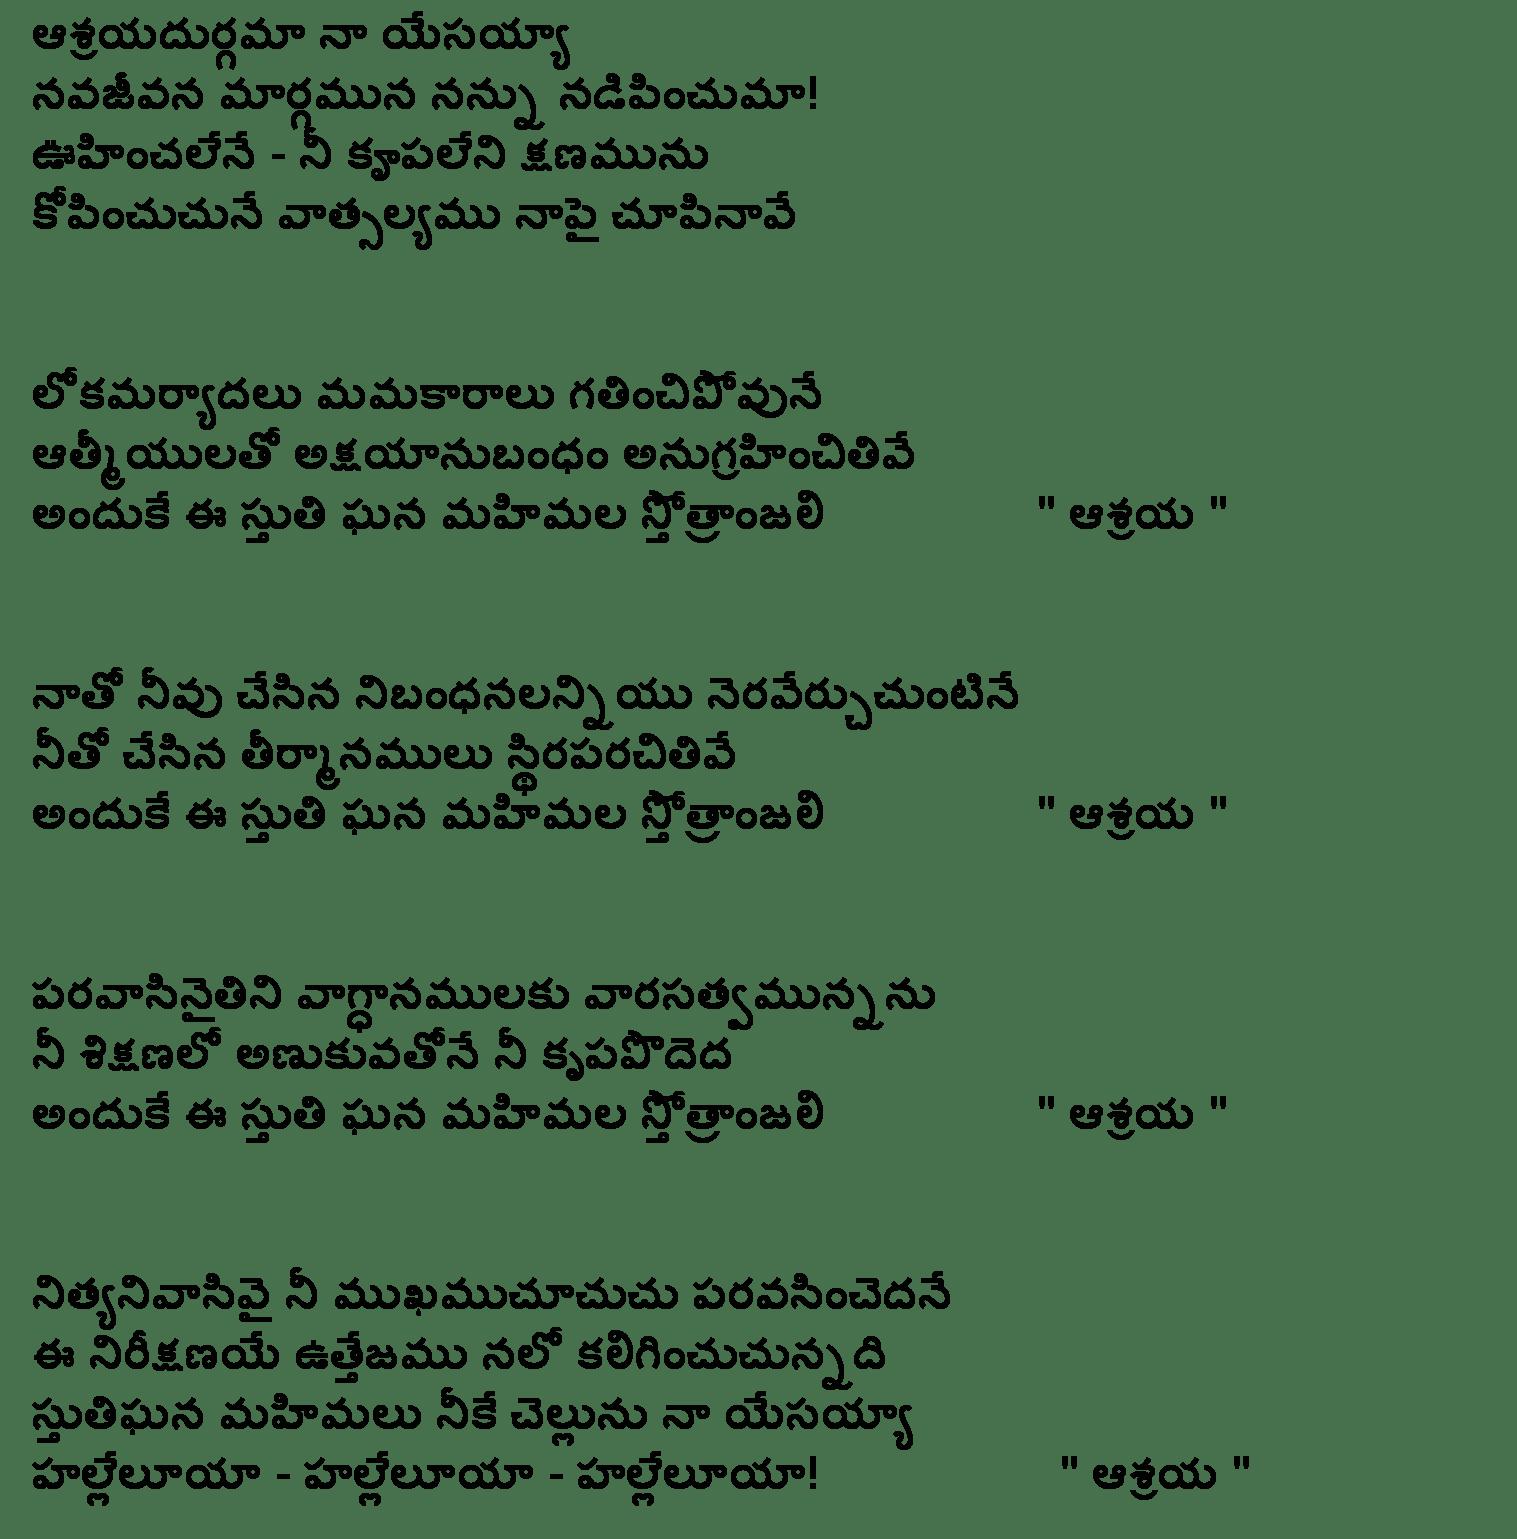 Vision dating song lyrics